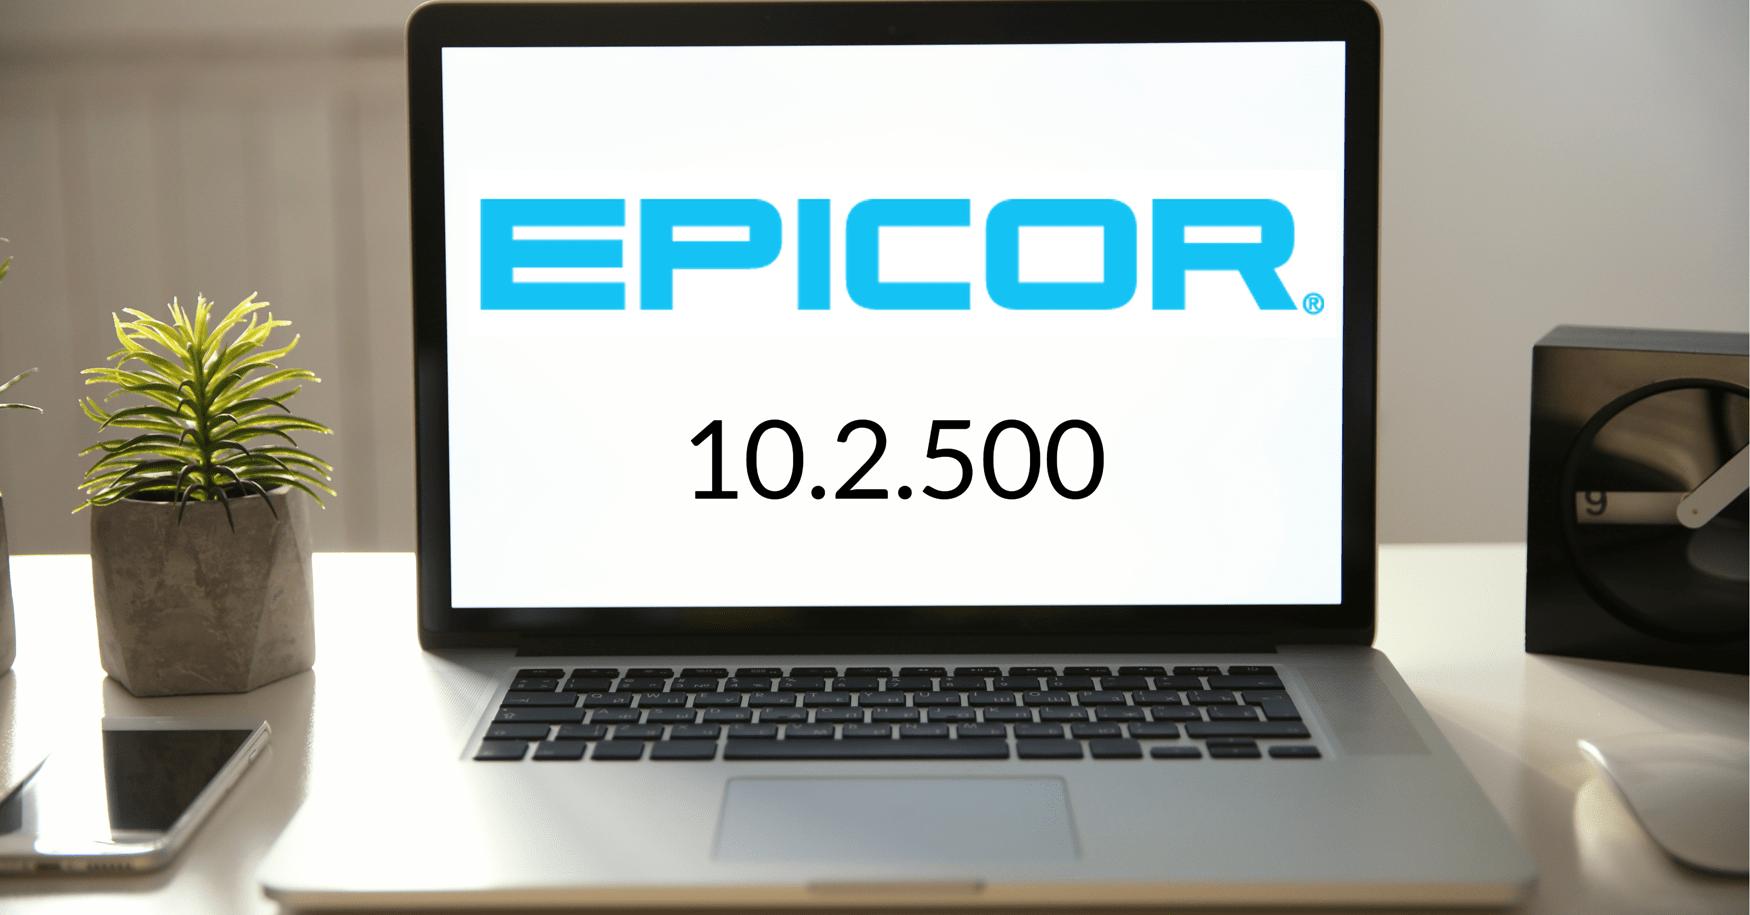 Epicor 10.2.500